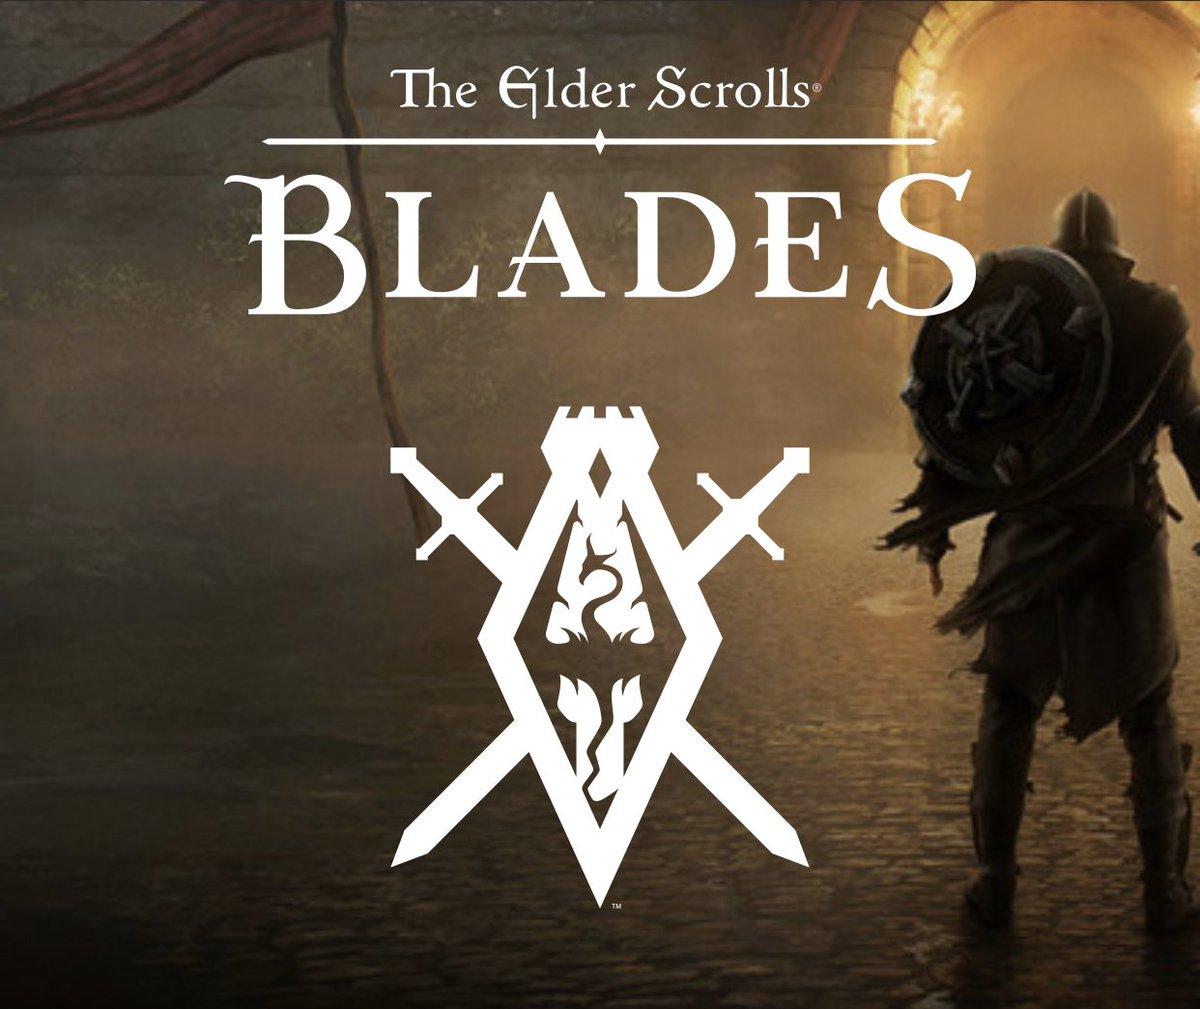 Join up #ElderScrolls #Blades #TESBlades https://apps.apple.com/us/app/the-elder-scrolls-blades/id1358476597…pic.twitter.com/kVxx3rjfuT